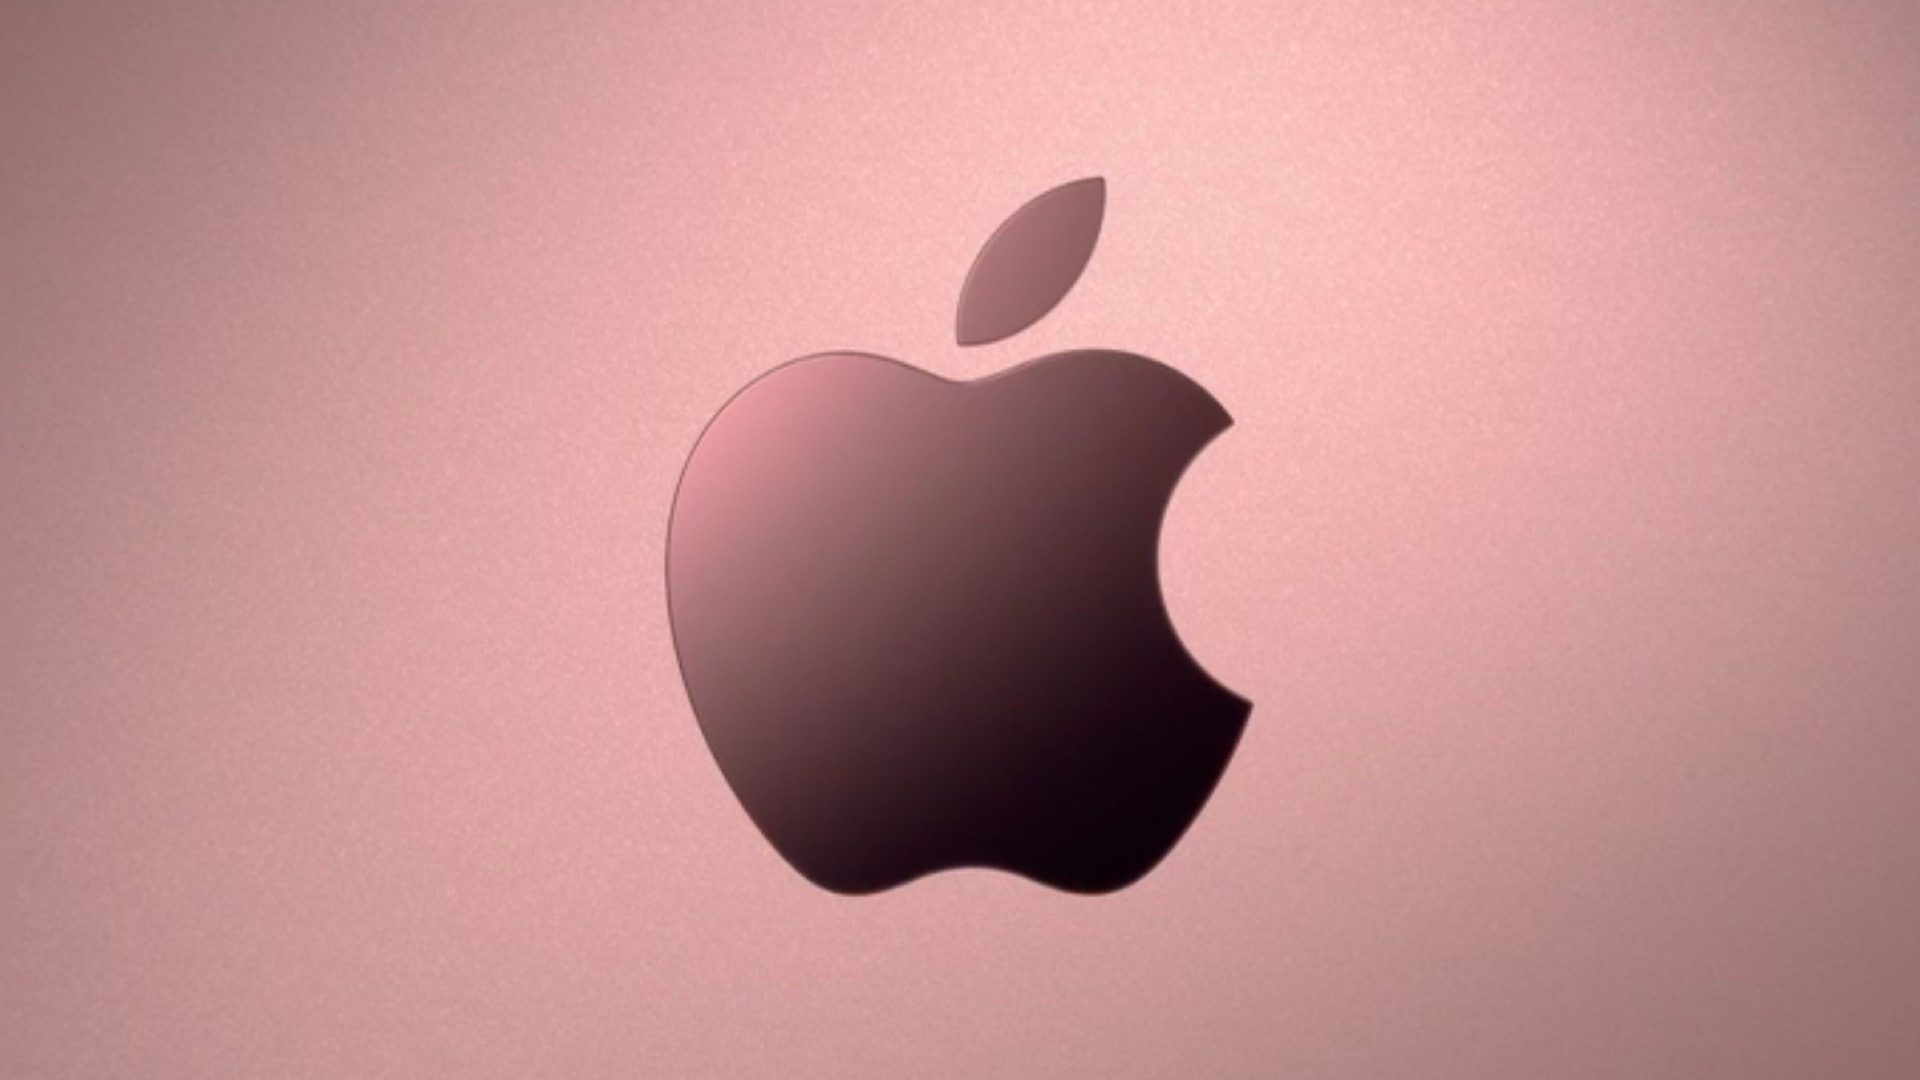 rose gold apple macbook